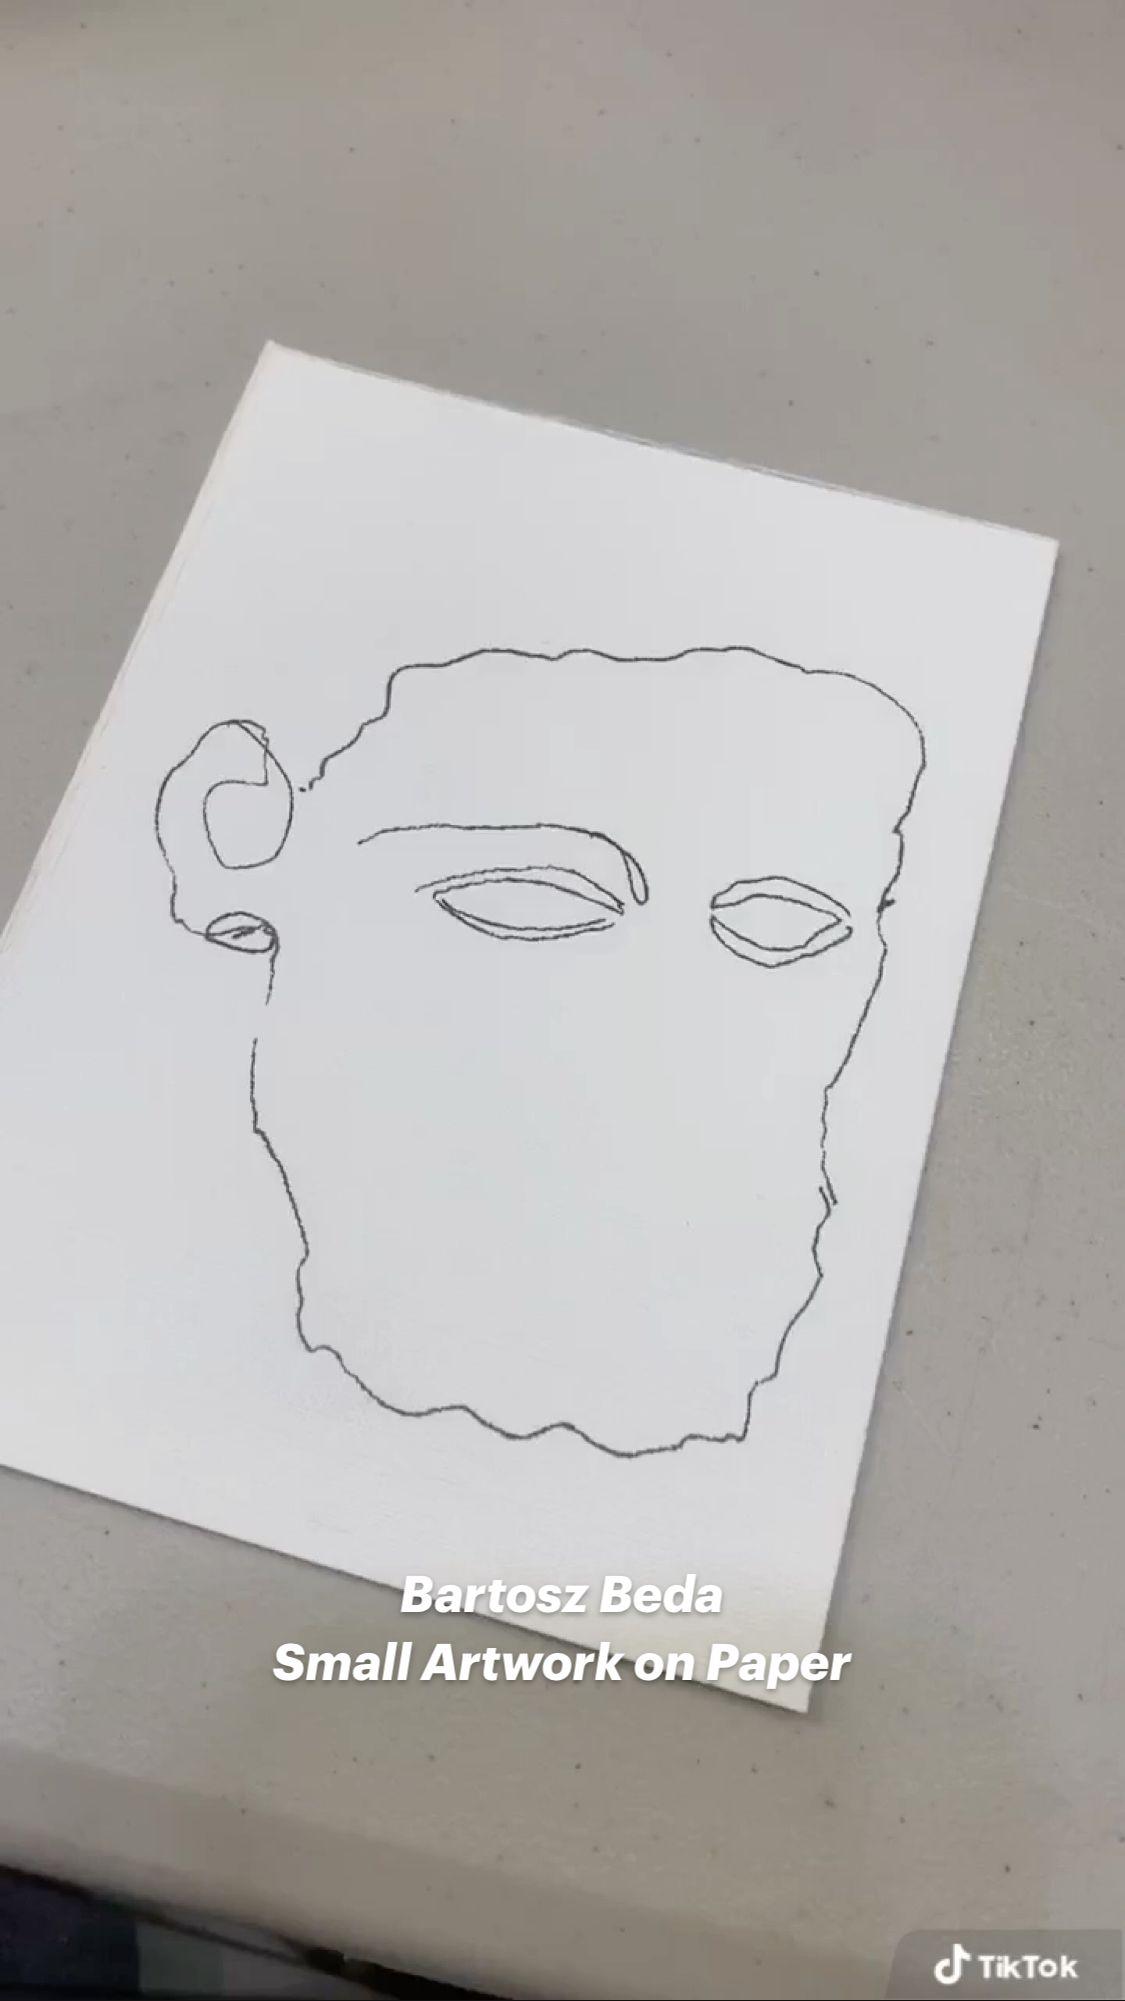 Bartosz Beda Small Artwork on Paper